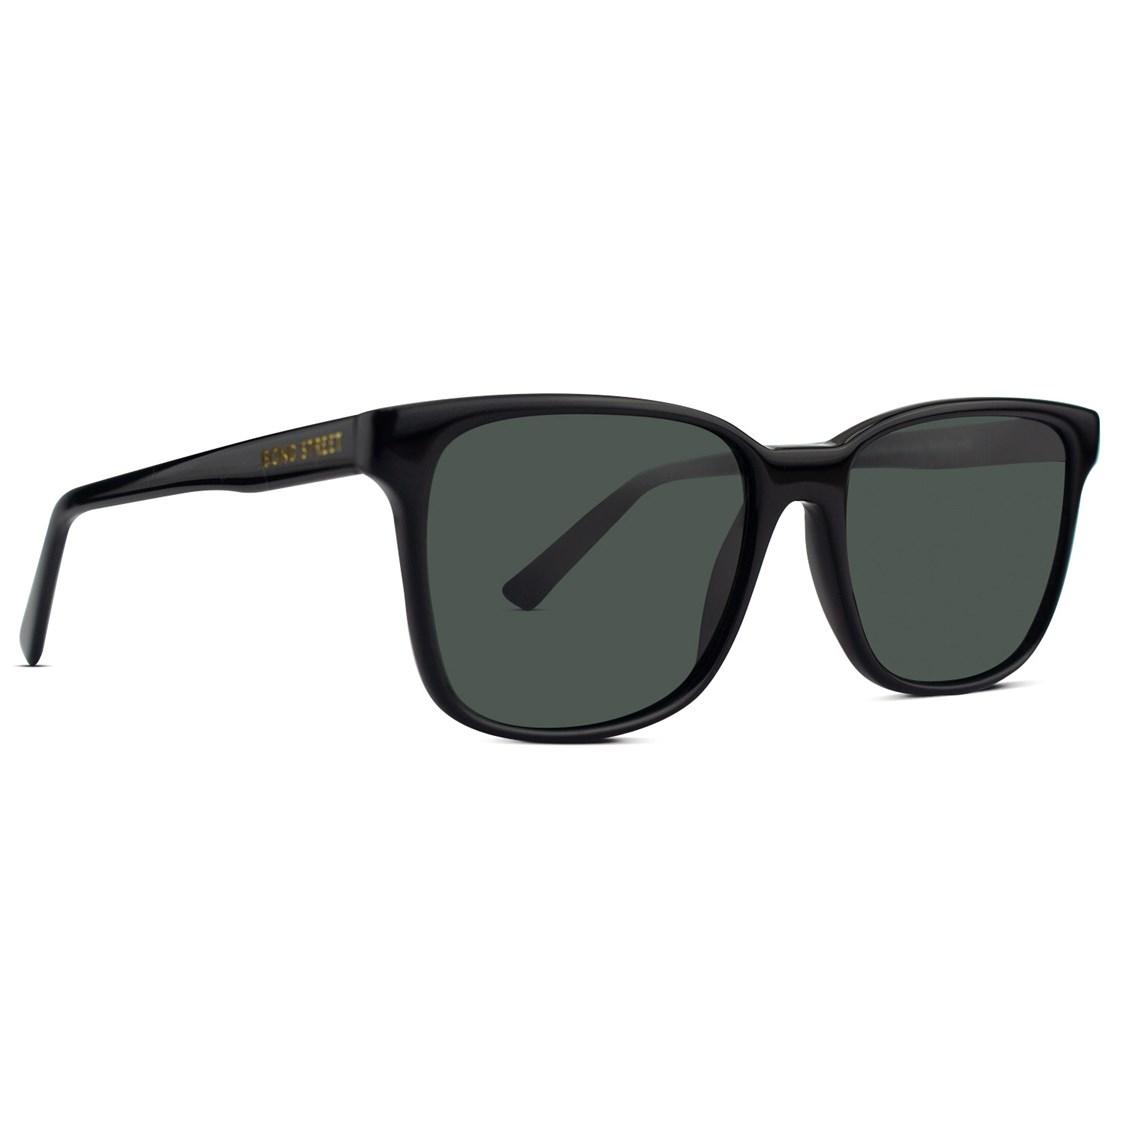 Óculos de Sol Bond Street Holborn 9140 001-54